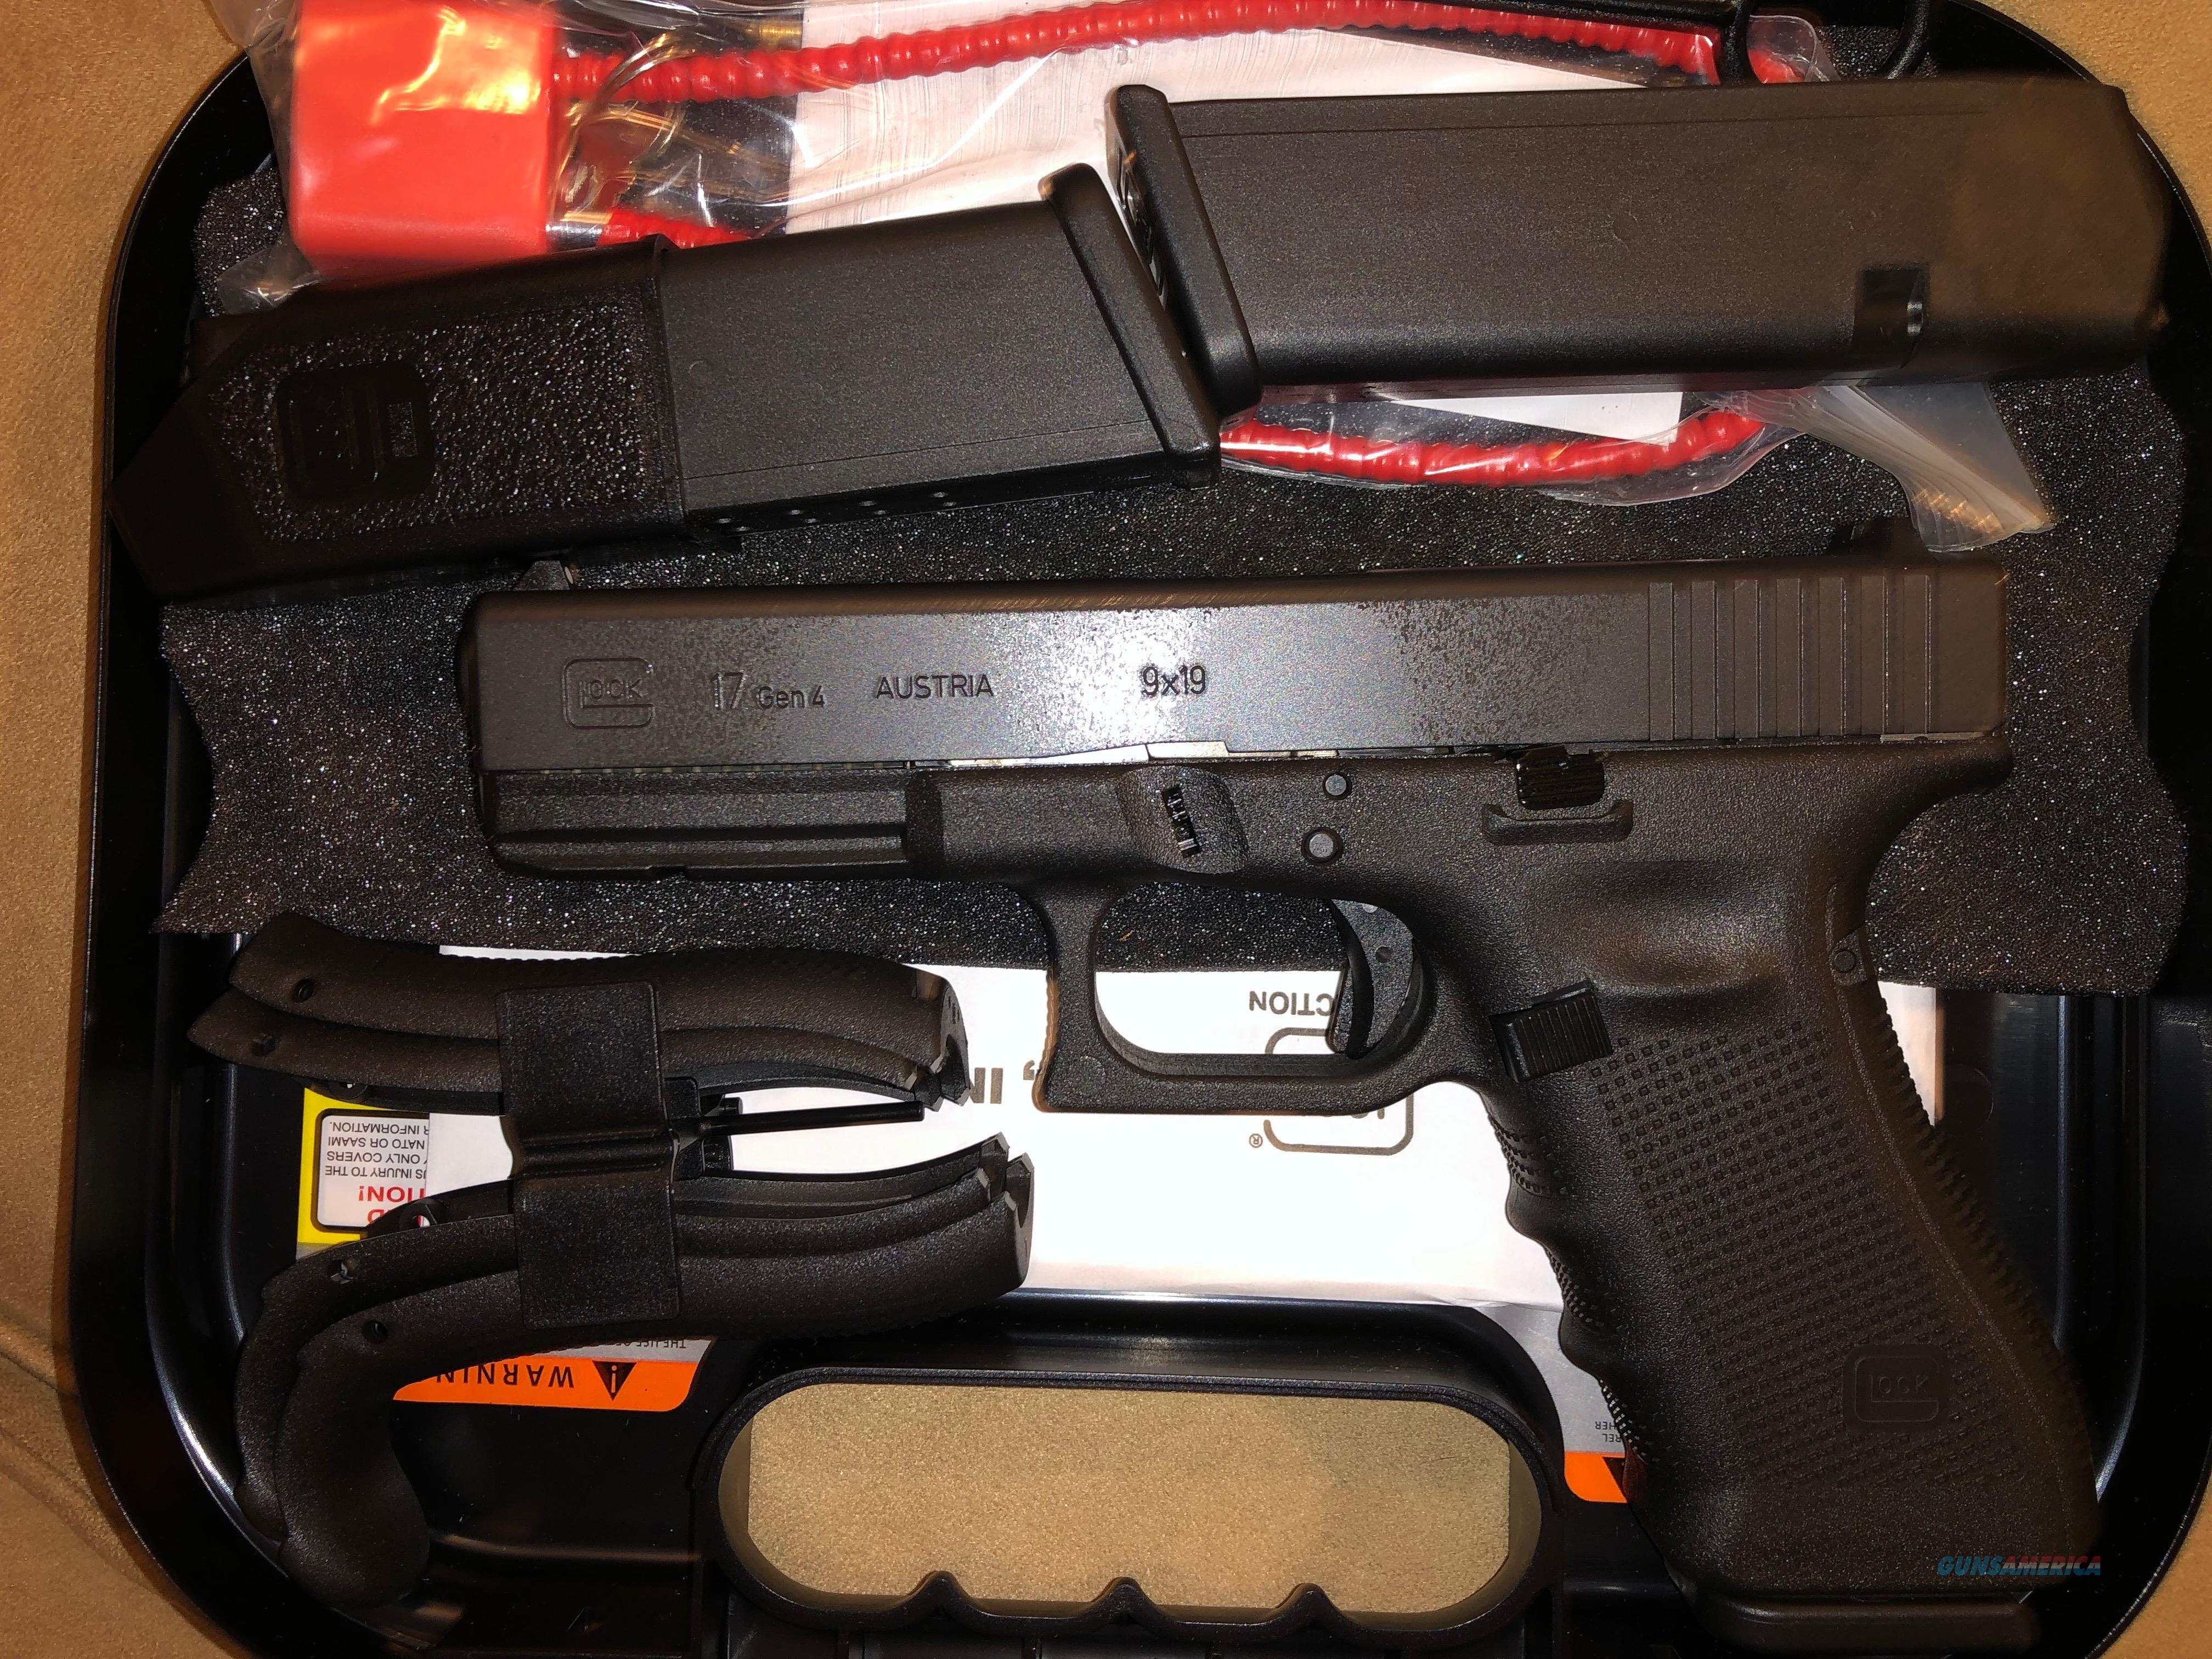 Glock 17. New Gen 4  Guns > Pistols > Glock Pistols > 17